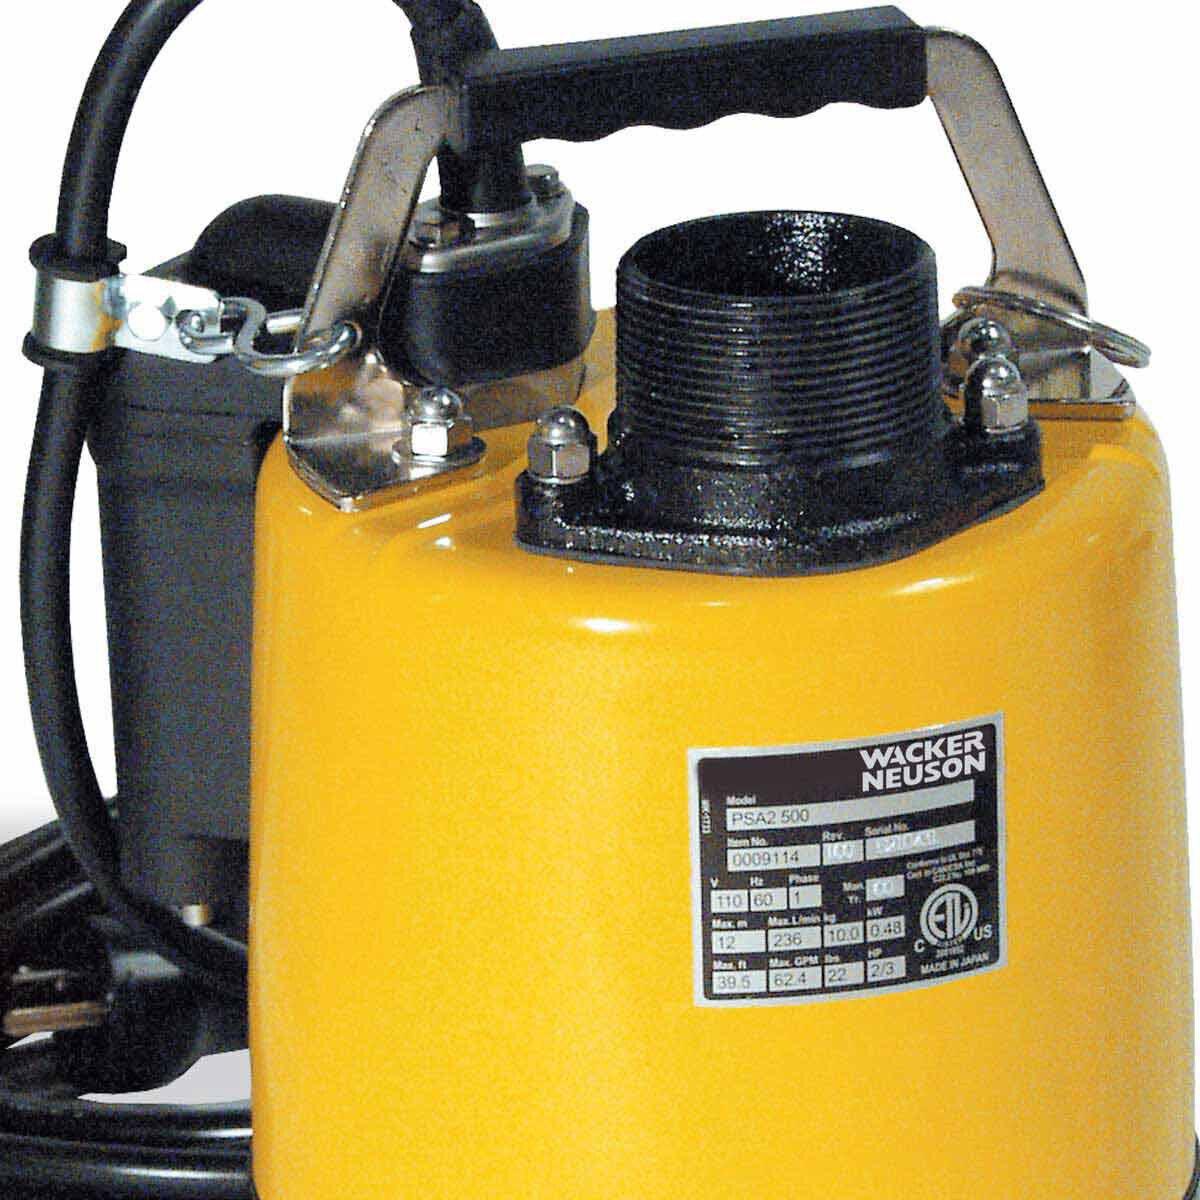 Wacker PSA 2 500 Pump Handle